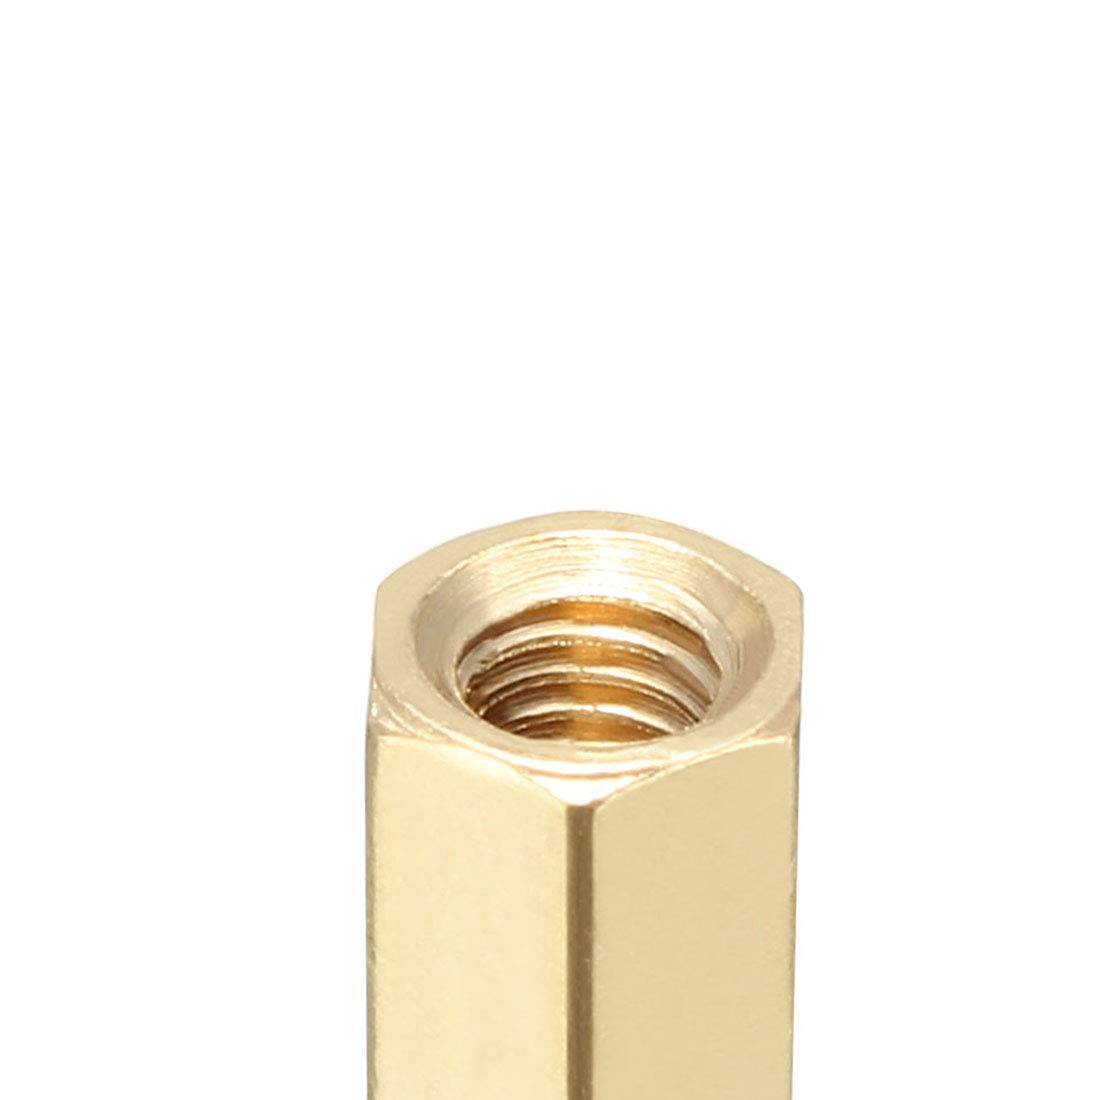 SuperWarehouse 50pcs M4 12+6mm Female Male Thread Brass Hex Standoff Spacer Screws PCB Pillar swh731452ca183652